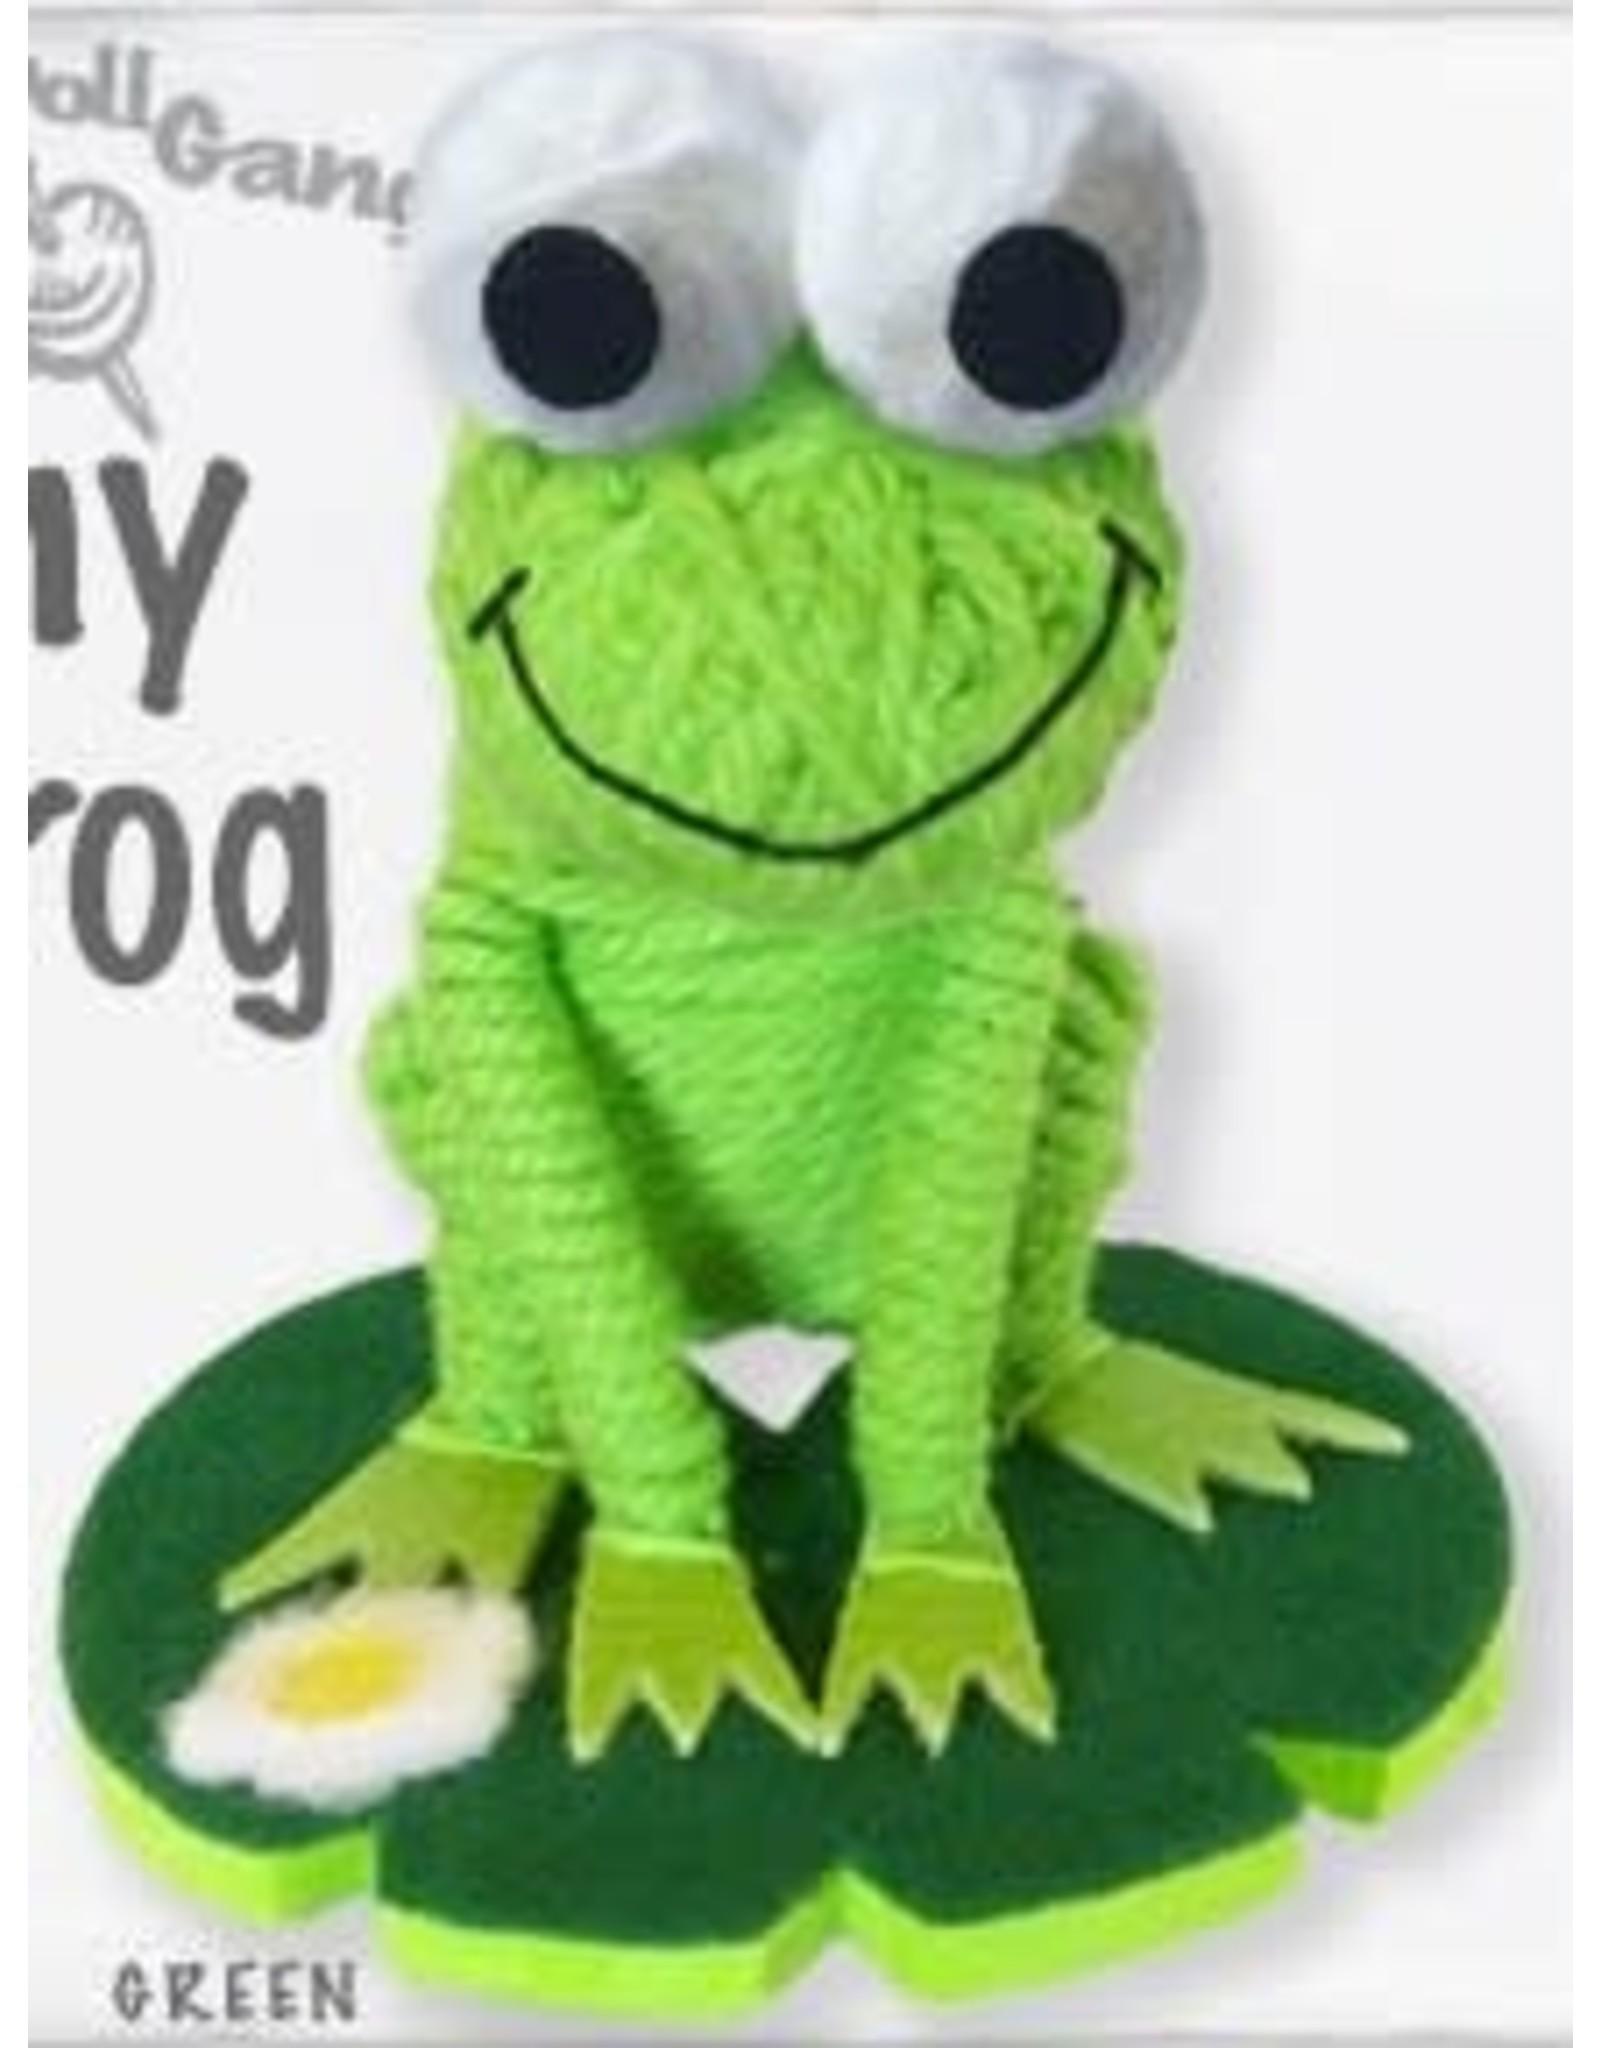 Stringdoll Franny the Frog